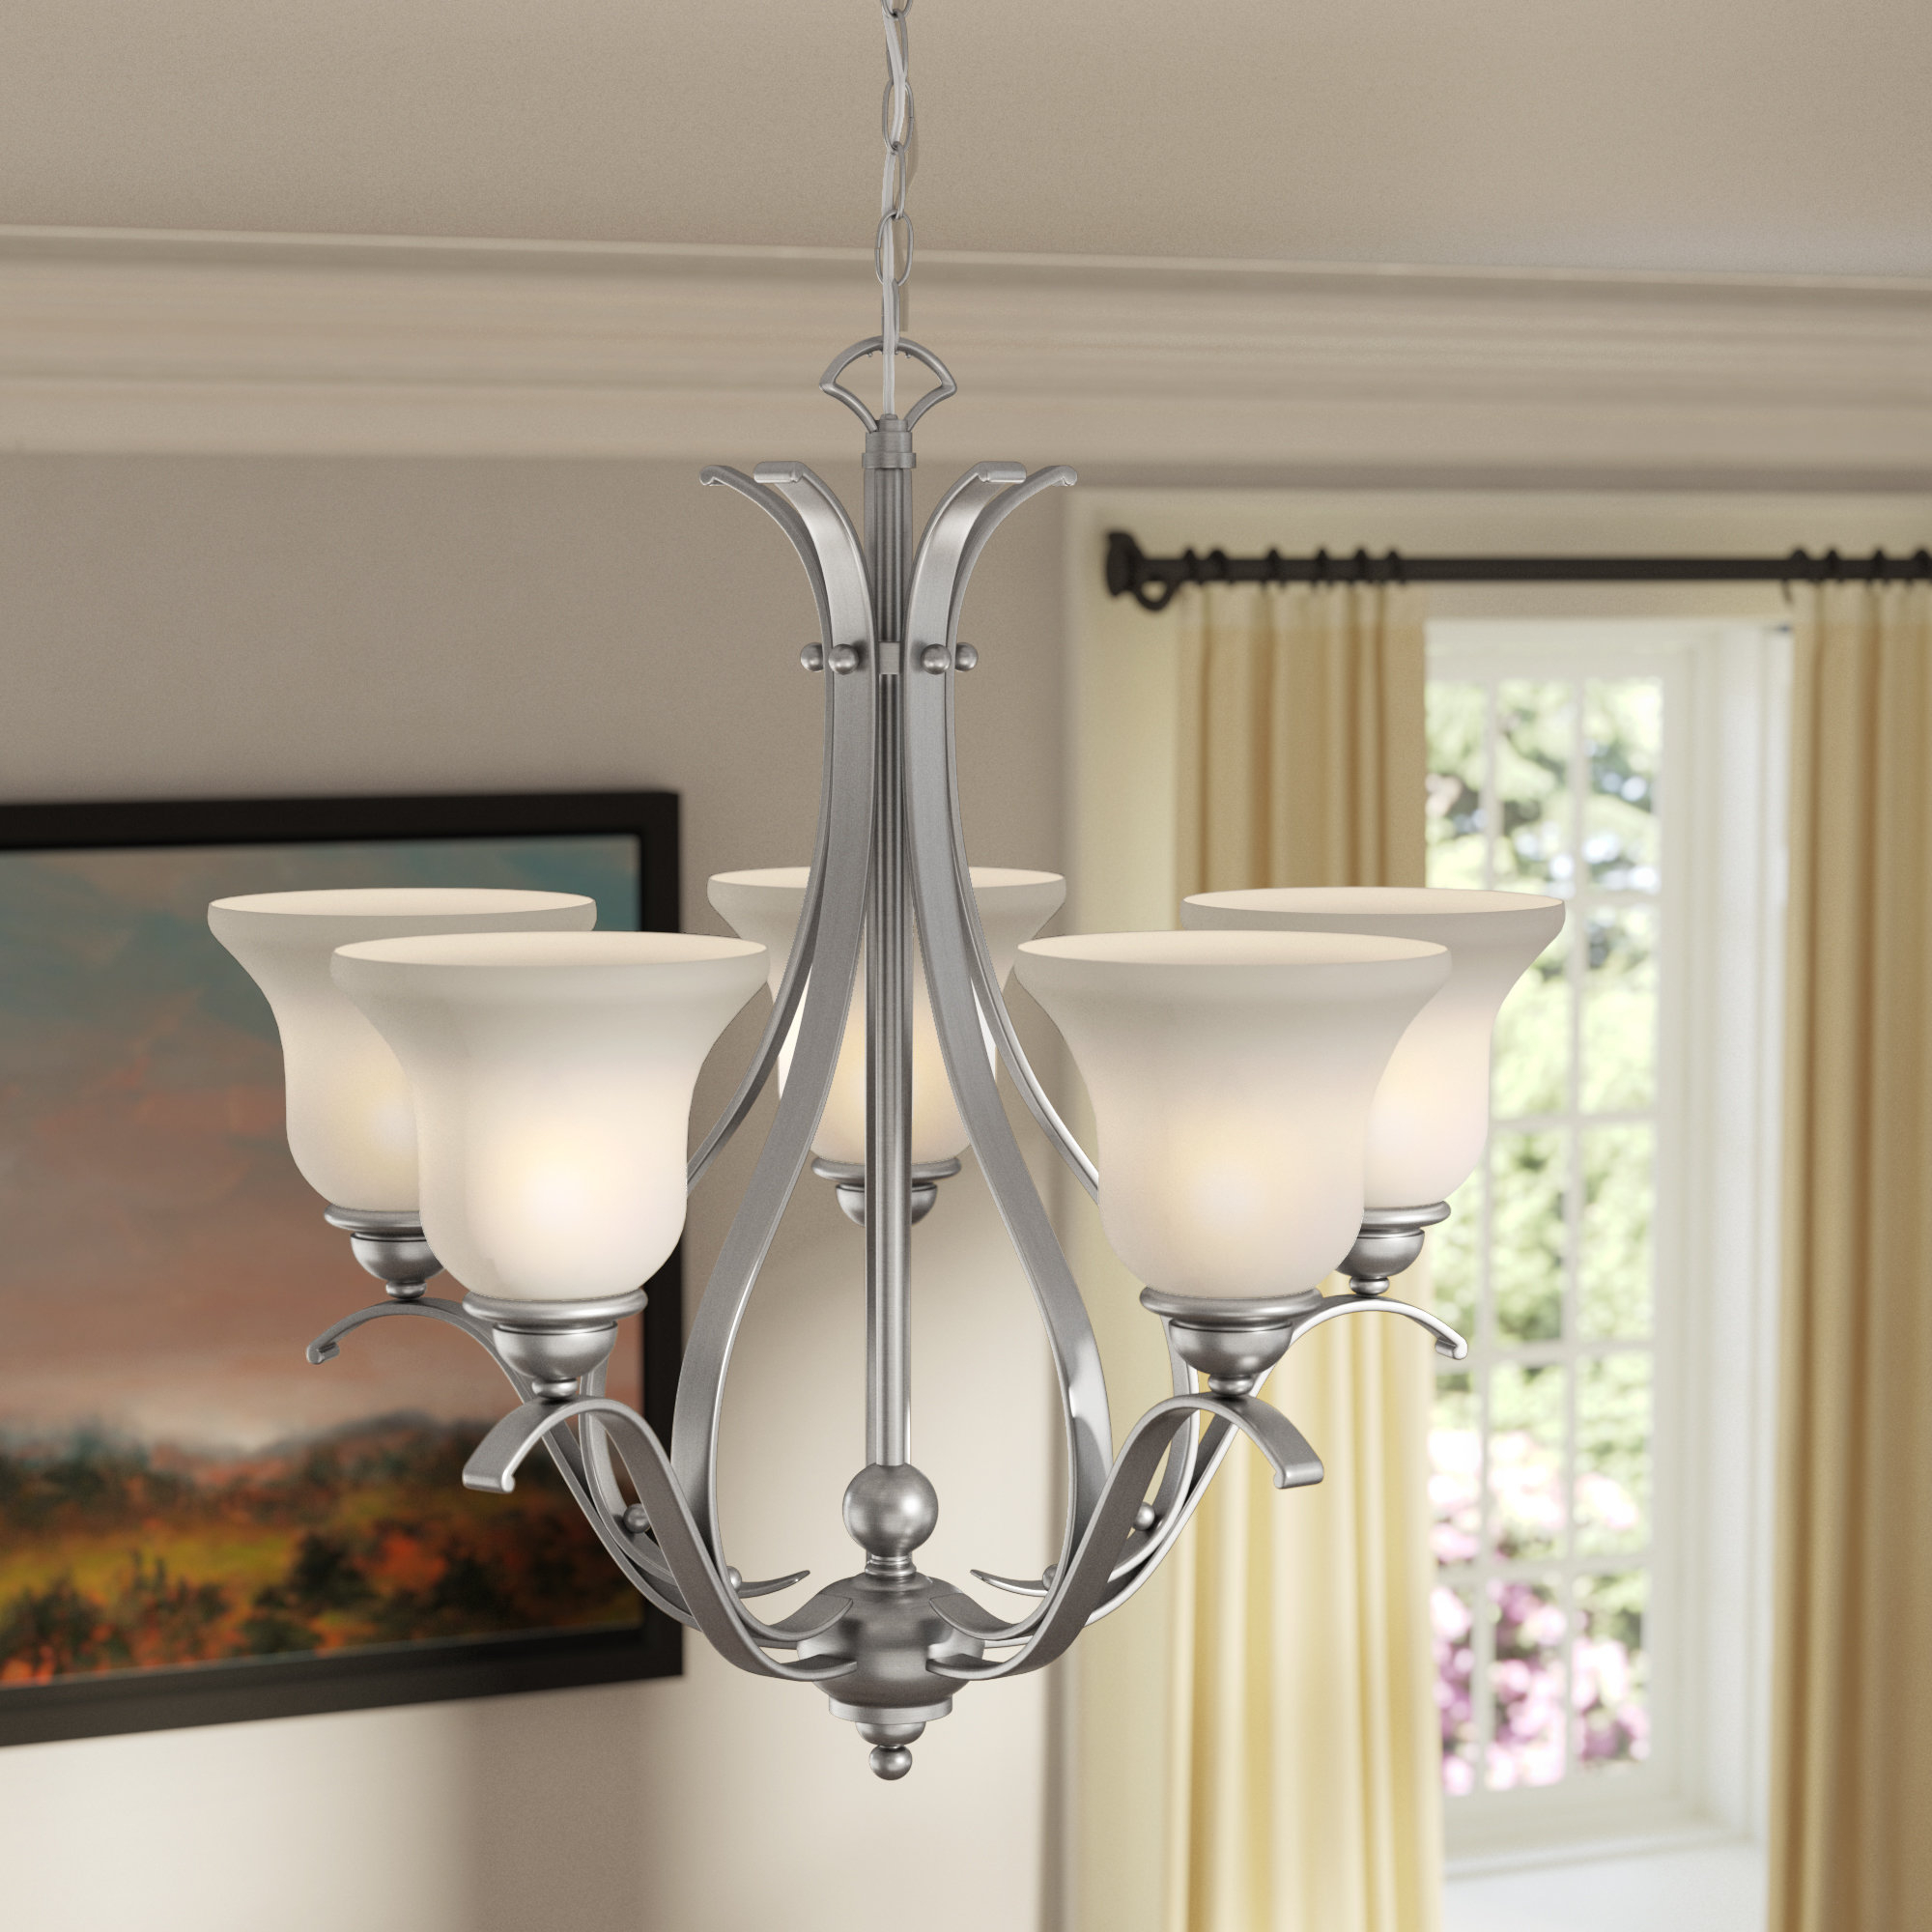 Van Horne 5 Light Shaded Chandelier With Well Known Van Horne 3 Light Single Teardrop Pendants (Gallery 18 of 25)